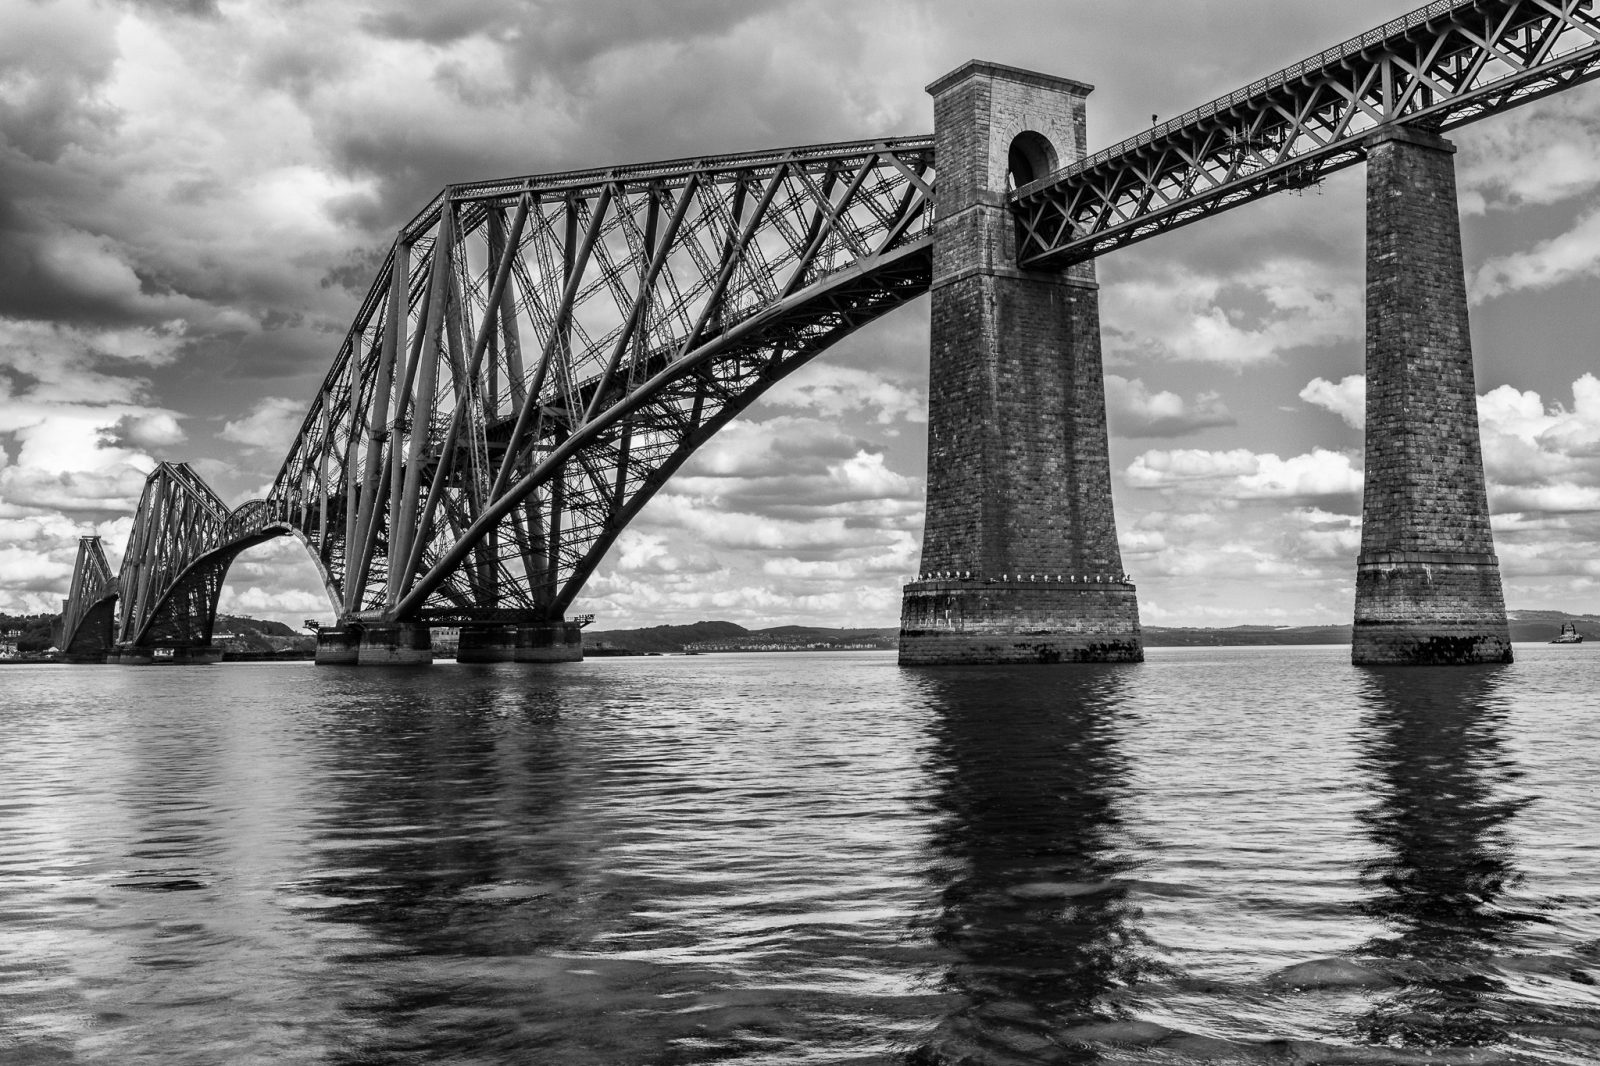 The iconic Forth Rail Bridge